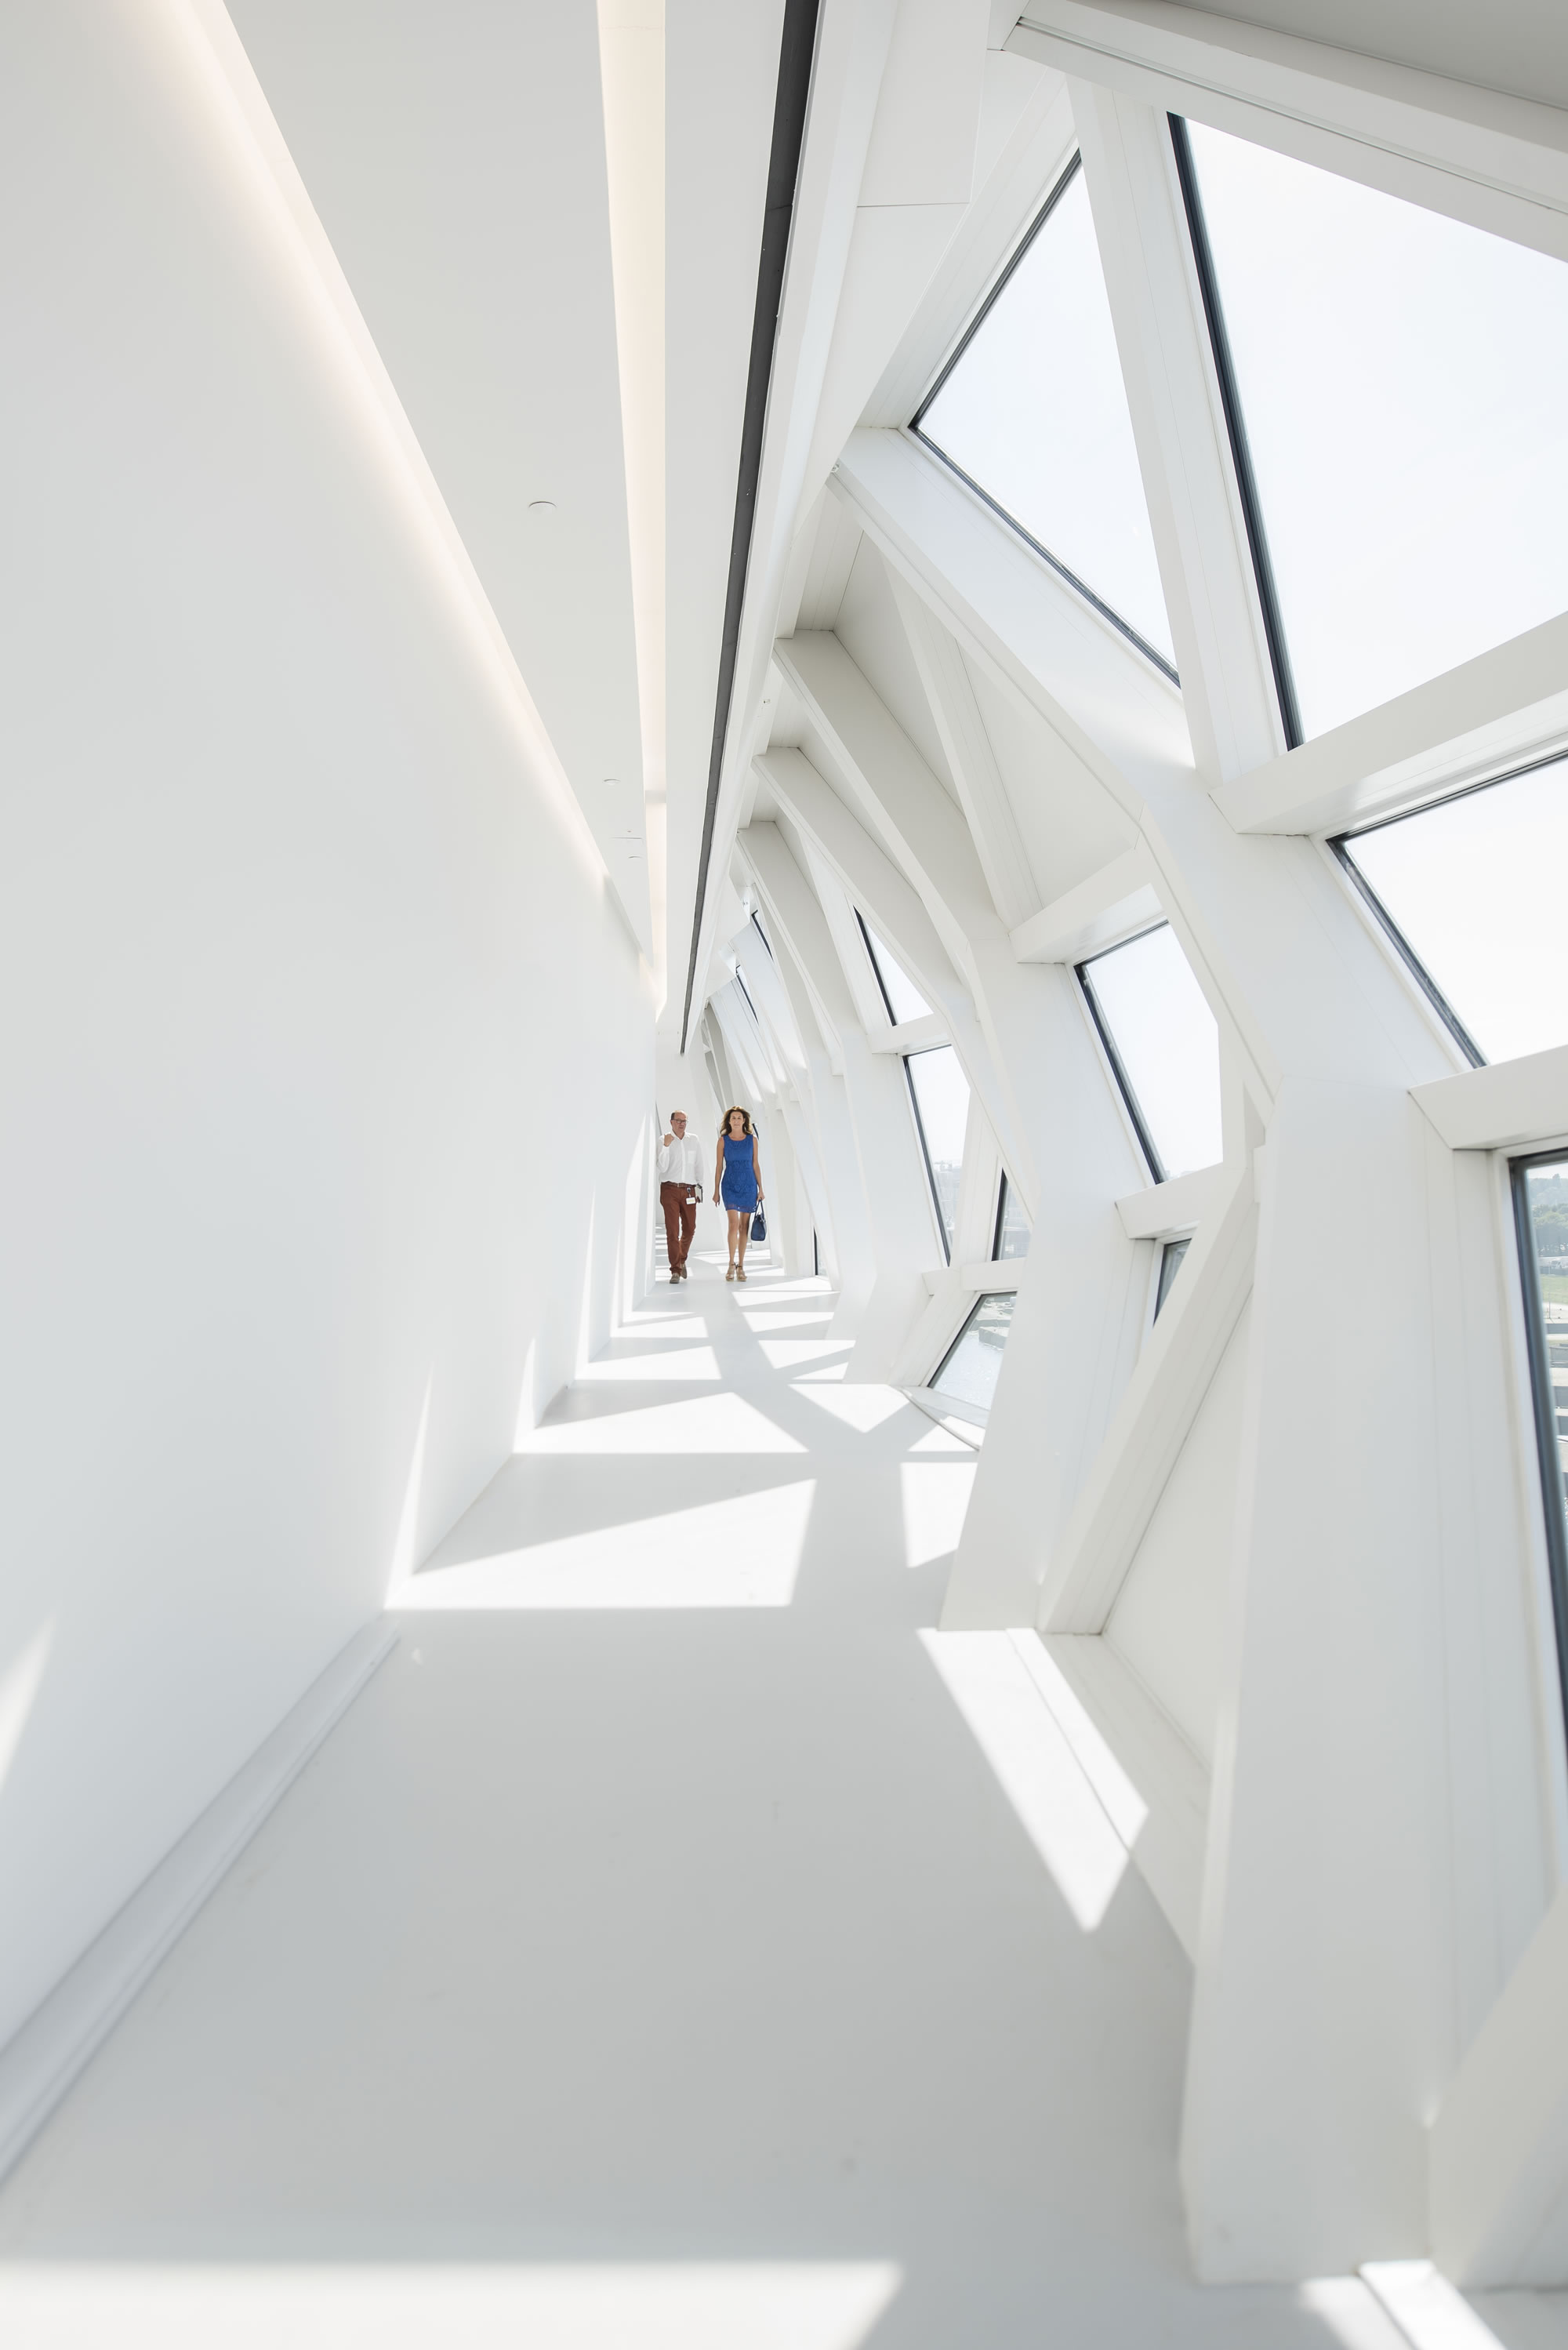 ZHA_Port House Antwerp_Corridor ∏ Tim Fisher 2016.jpg